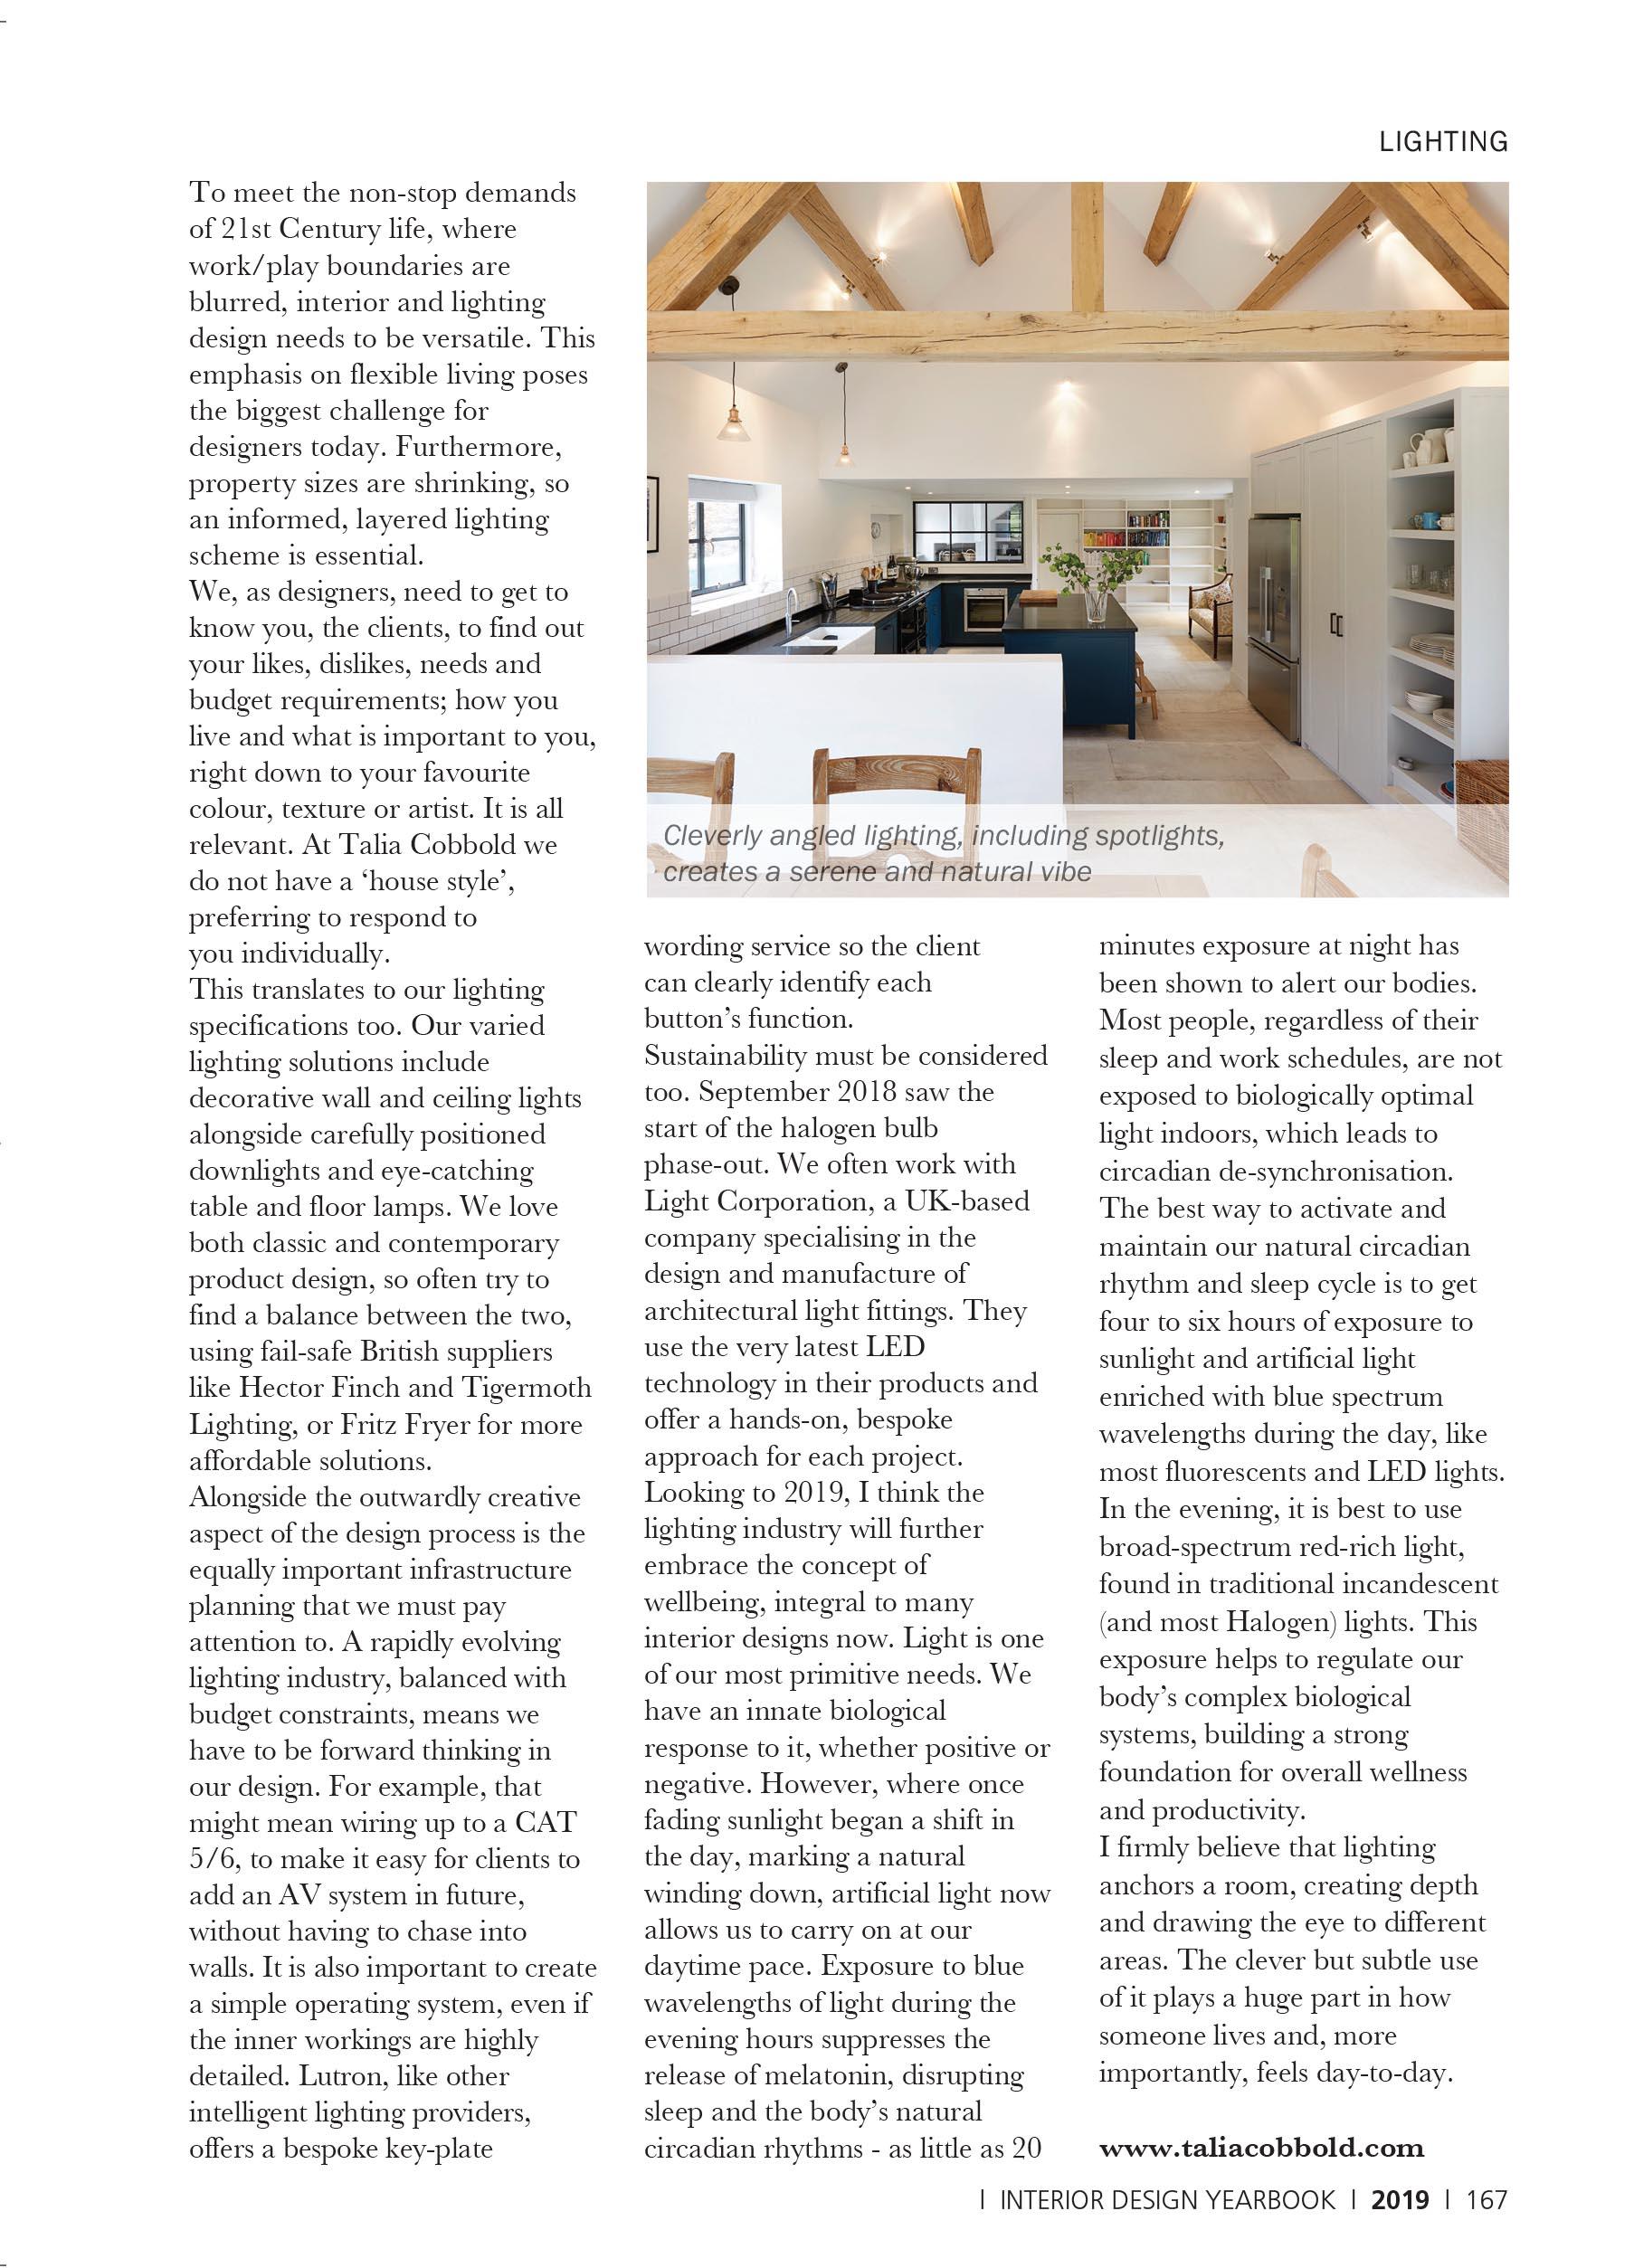 interior-design-yearbook-2019-inner-2.jpg